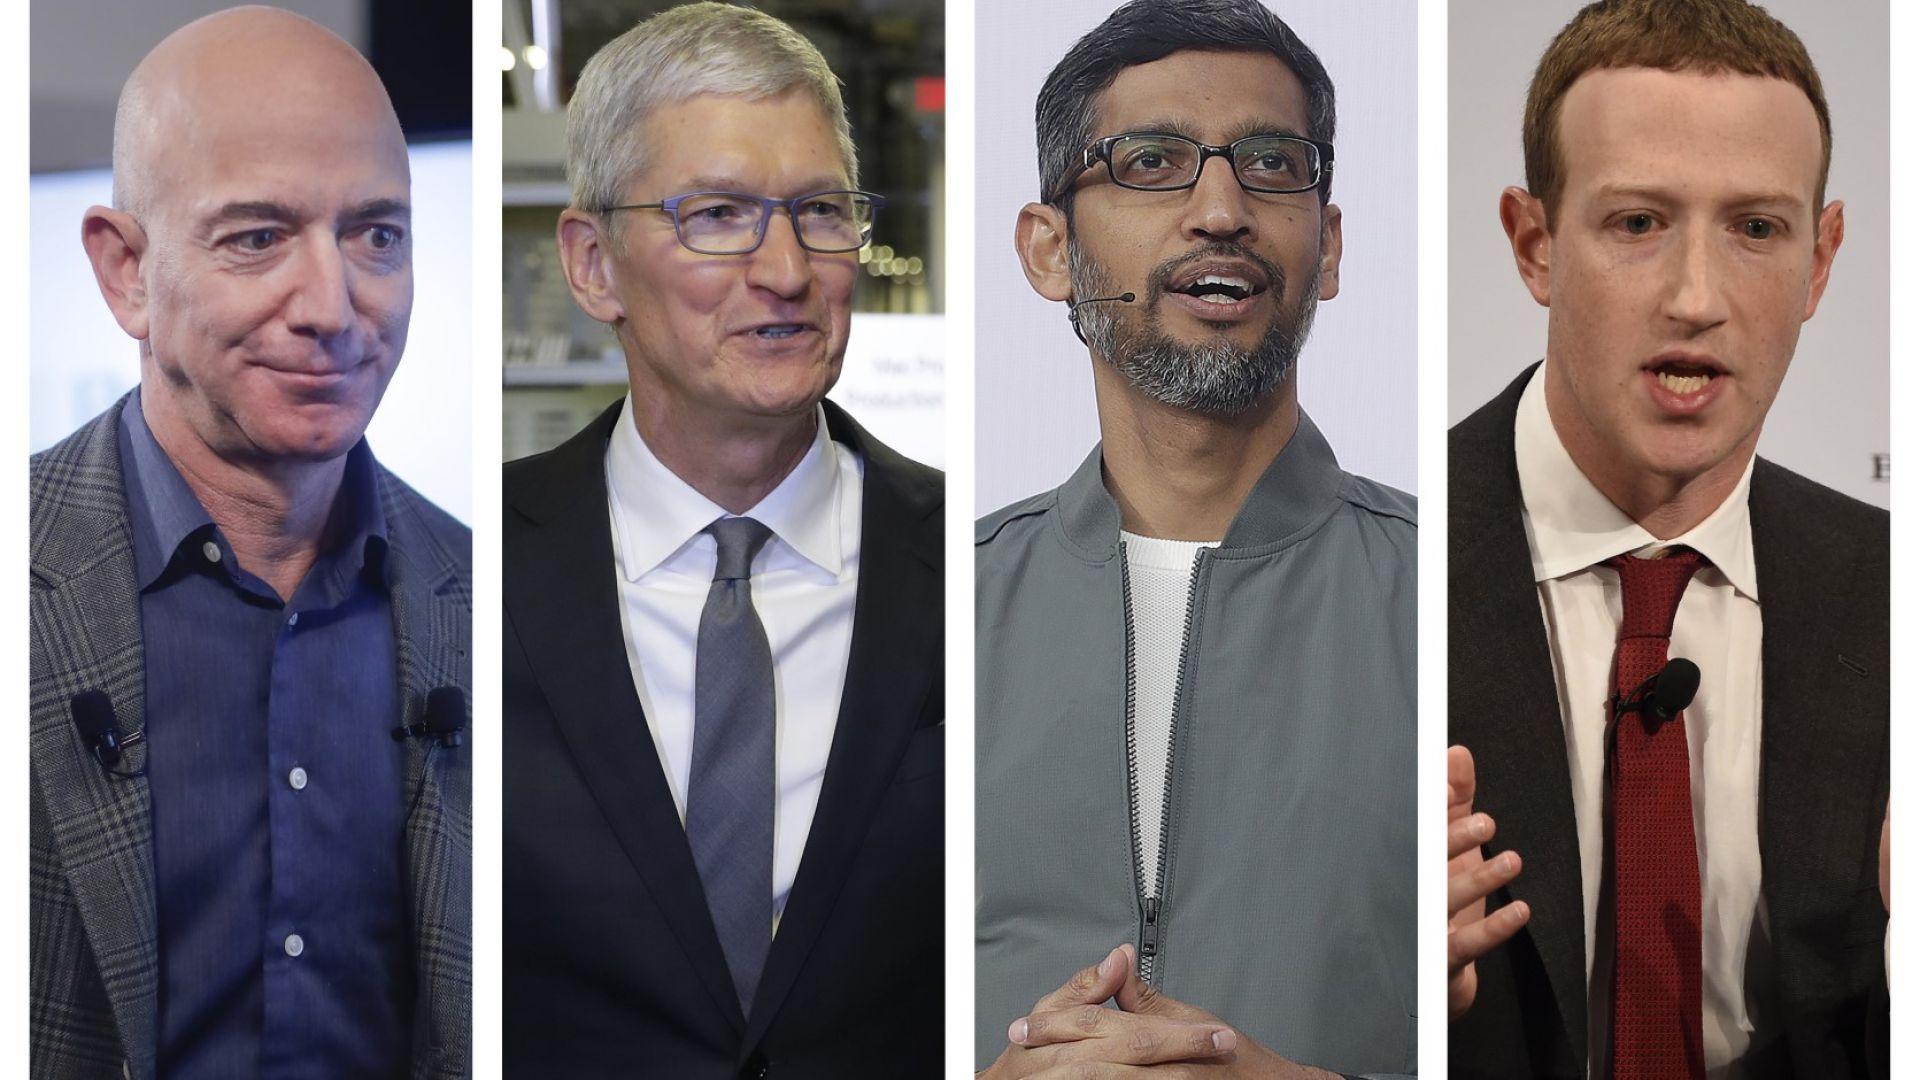 САЩ: Google, Amazon, Apple и Facebook са опасни за демокрацията